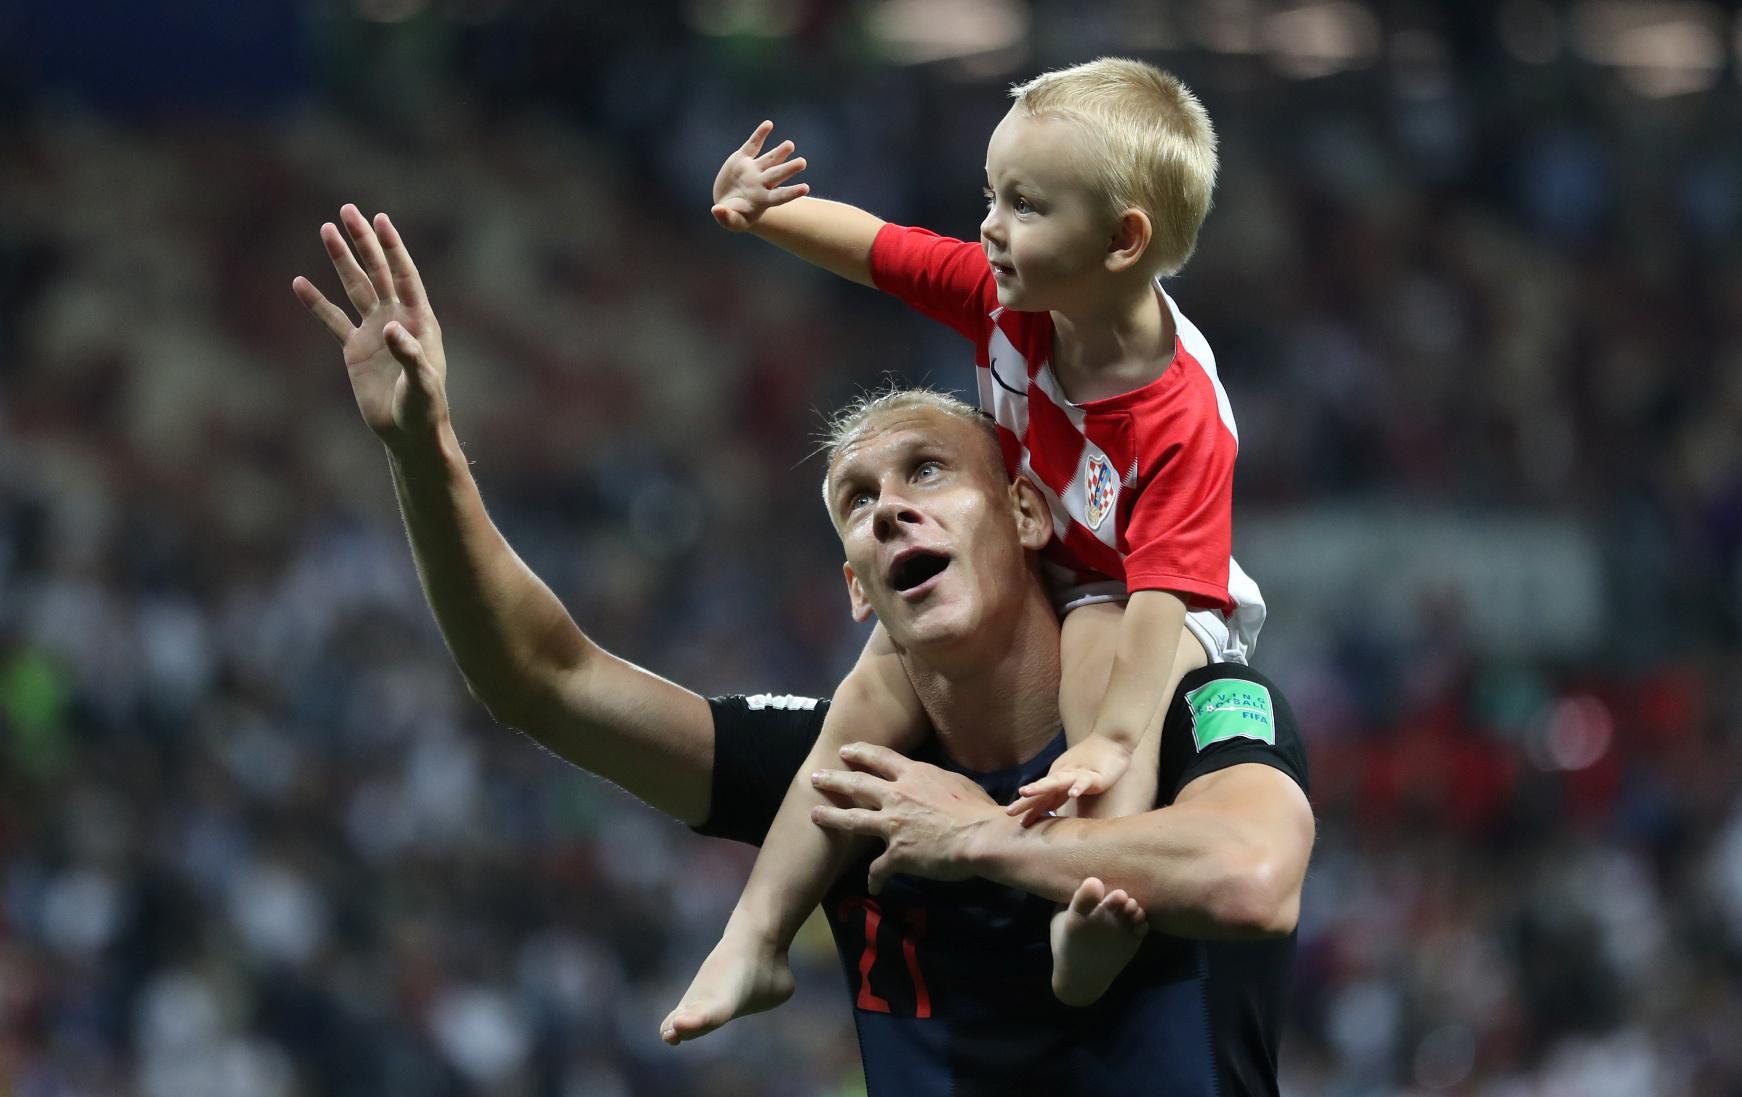 Soccer Football - World Cup - Semi Final - Croatia v England - Luzhniki Stadium, Moscow, Russia - July 11, 2018  Croatia's Domagoj Vida celebrates with child after the match   REUTERS/Carl Recine - RC1B72A93280